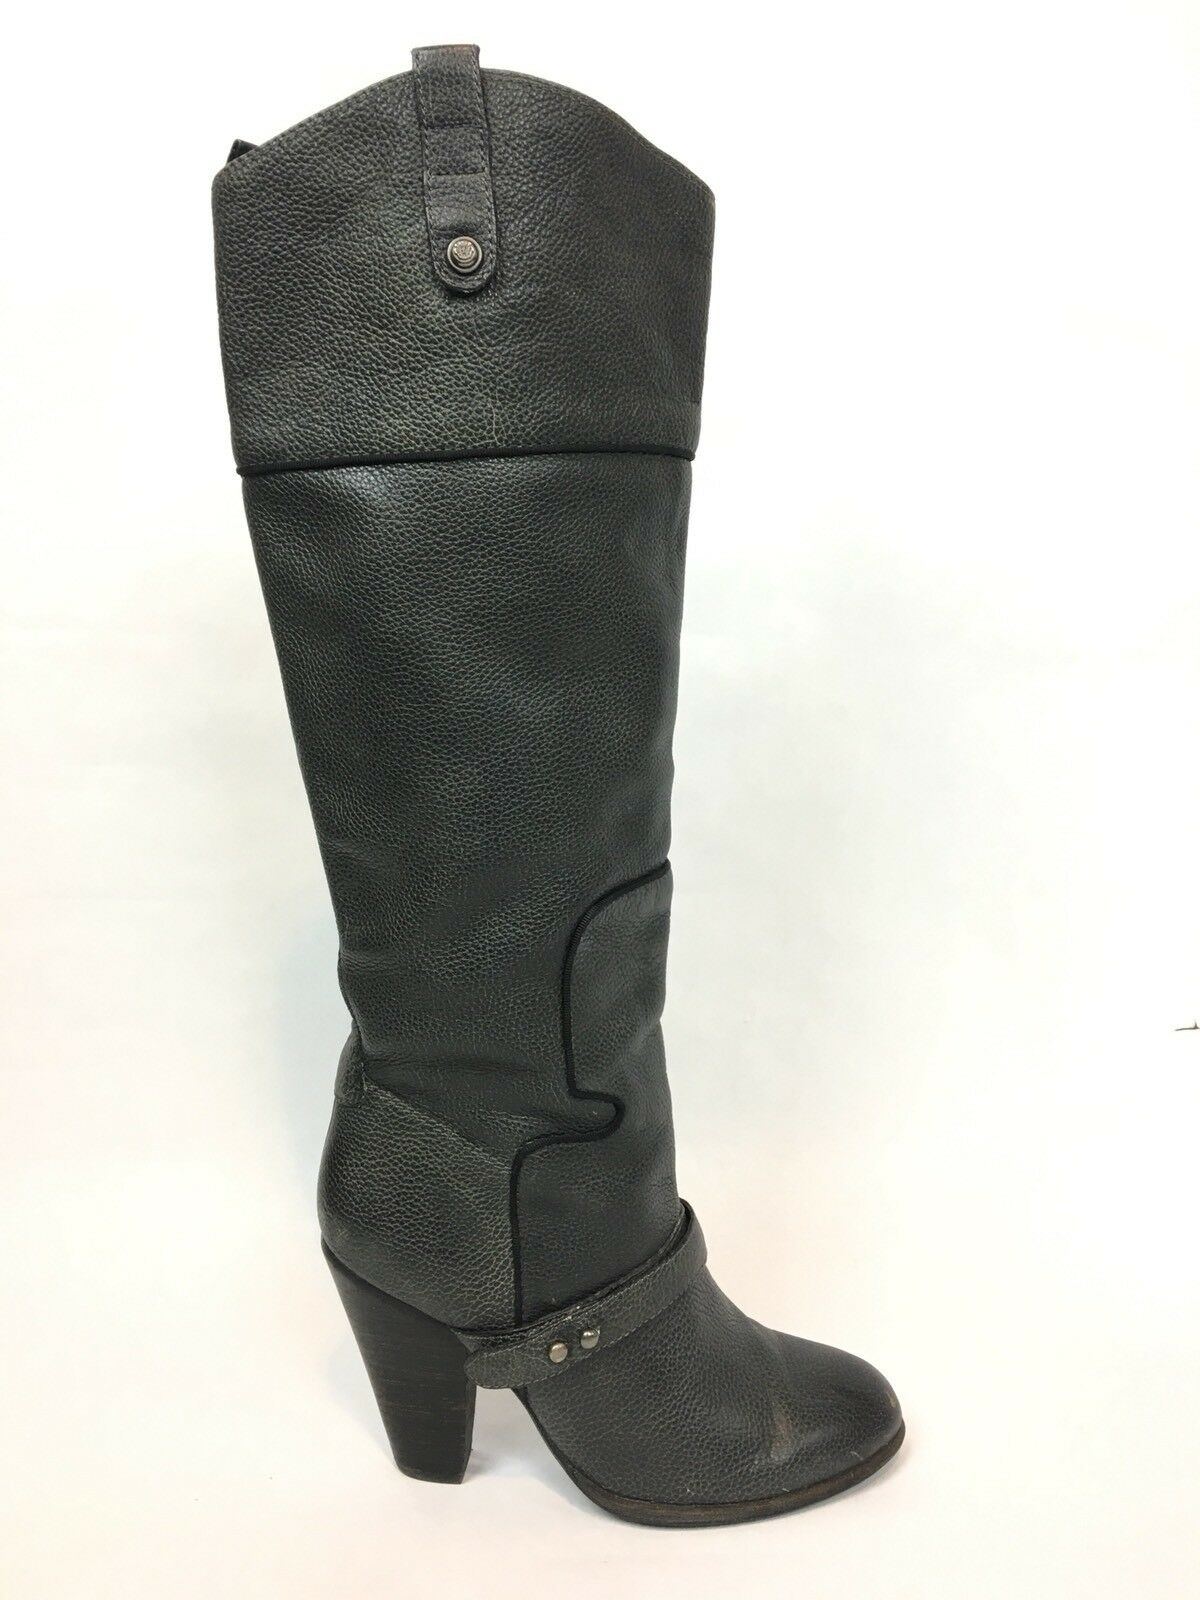 Sam Edelman Naharra Gray/Black Pebbled Leather Boots / Women's Size 6M